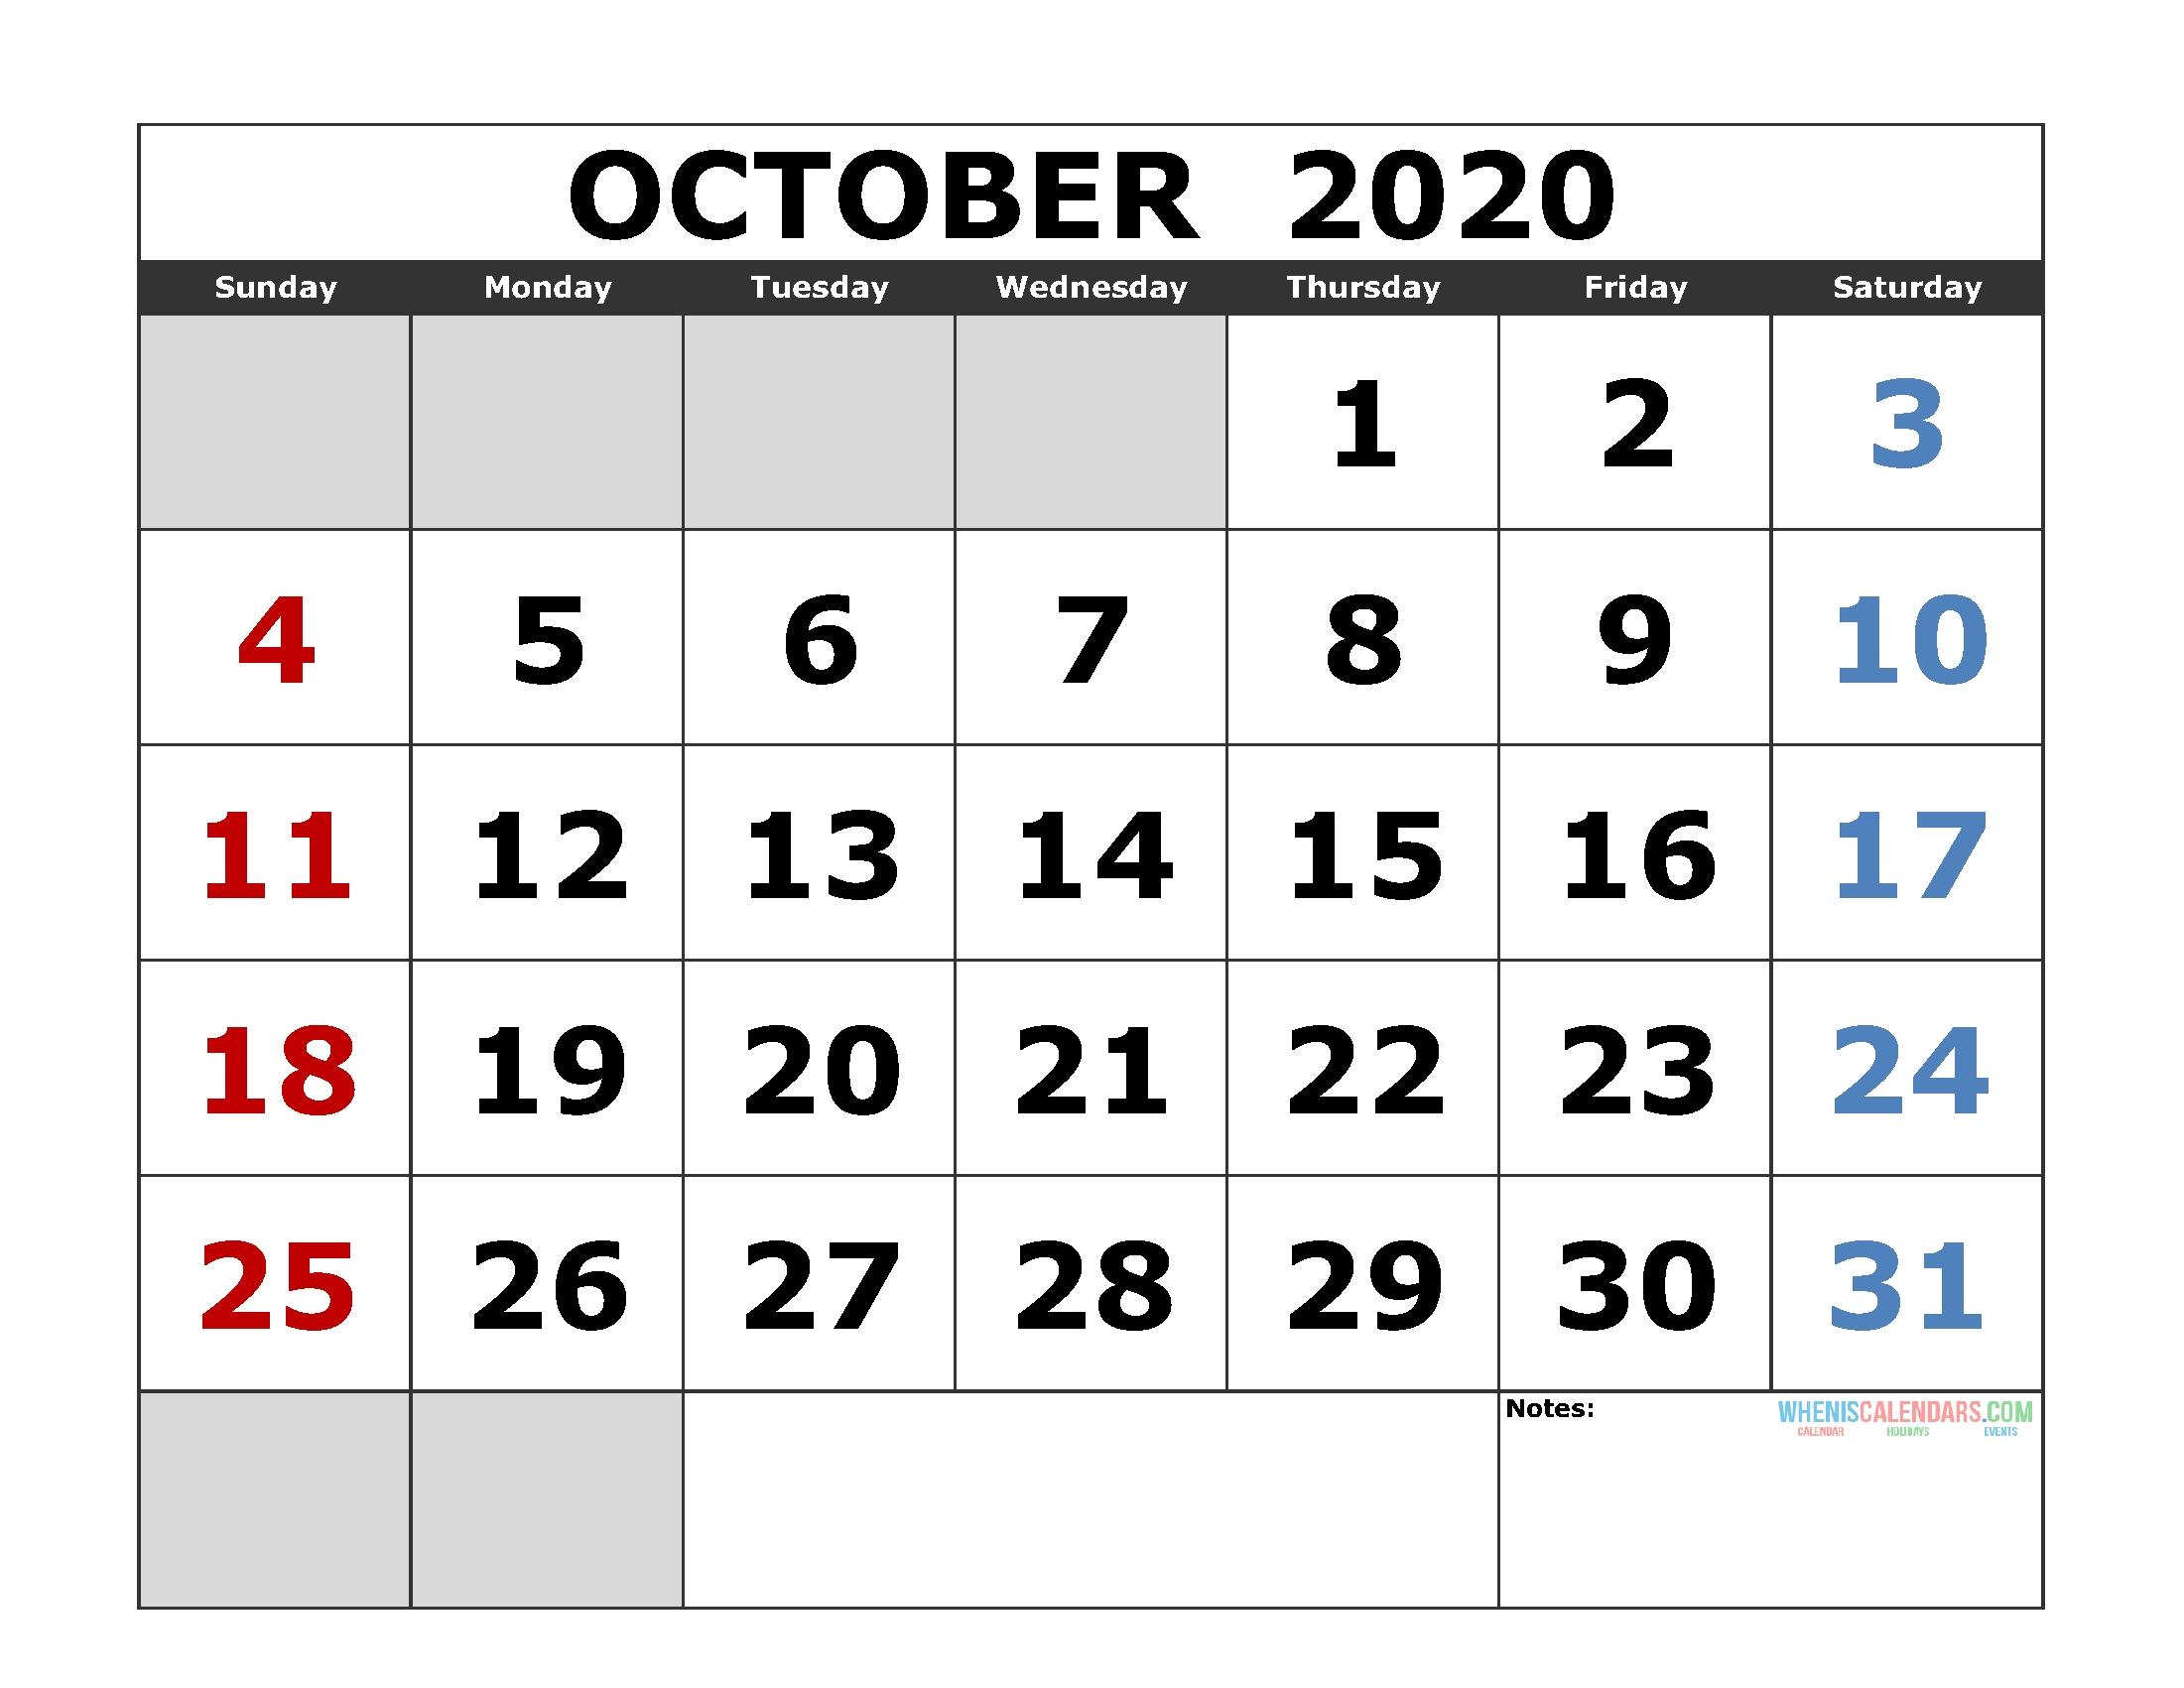 October 2020 Printable Calendar Template Excel, Pdf, Image-2020 Calendar With Jewish Holidays Pdf